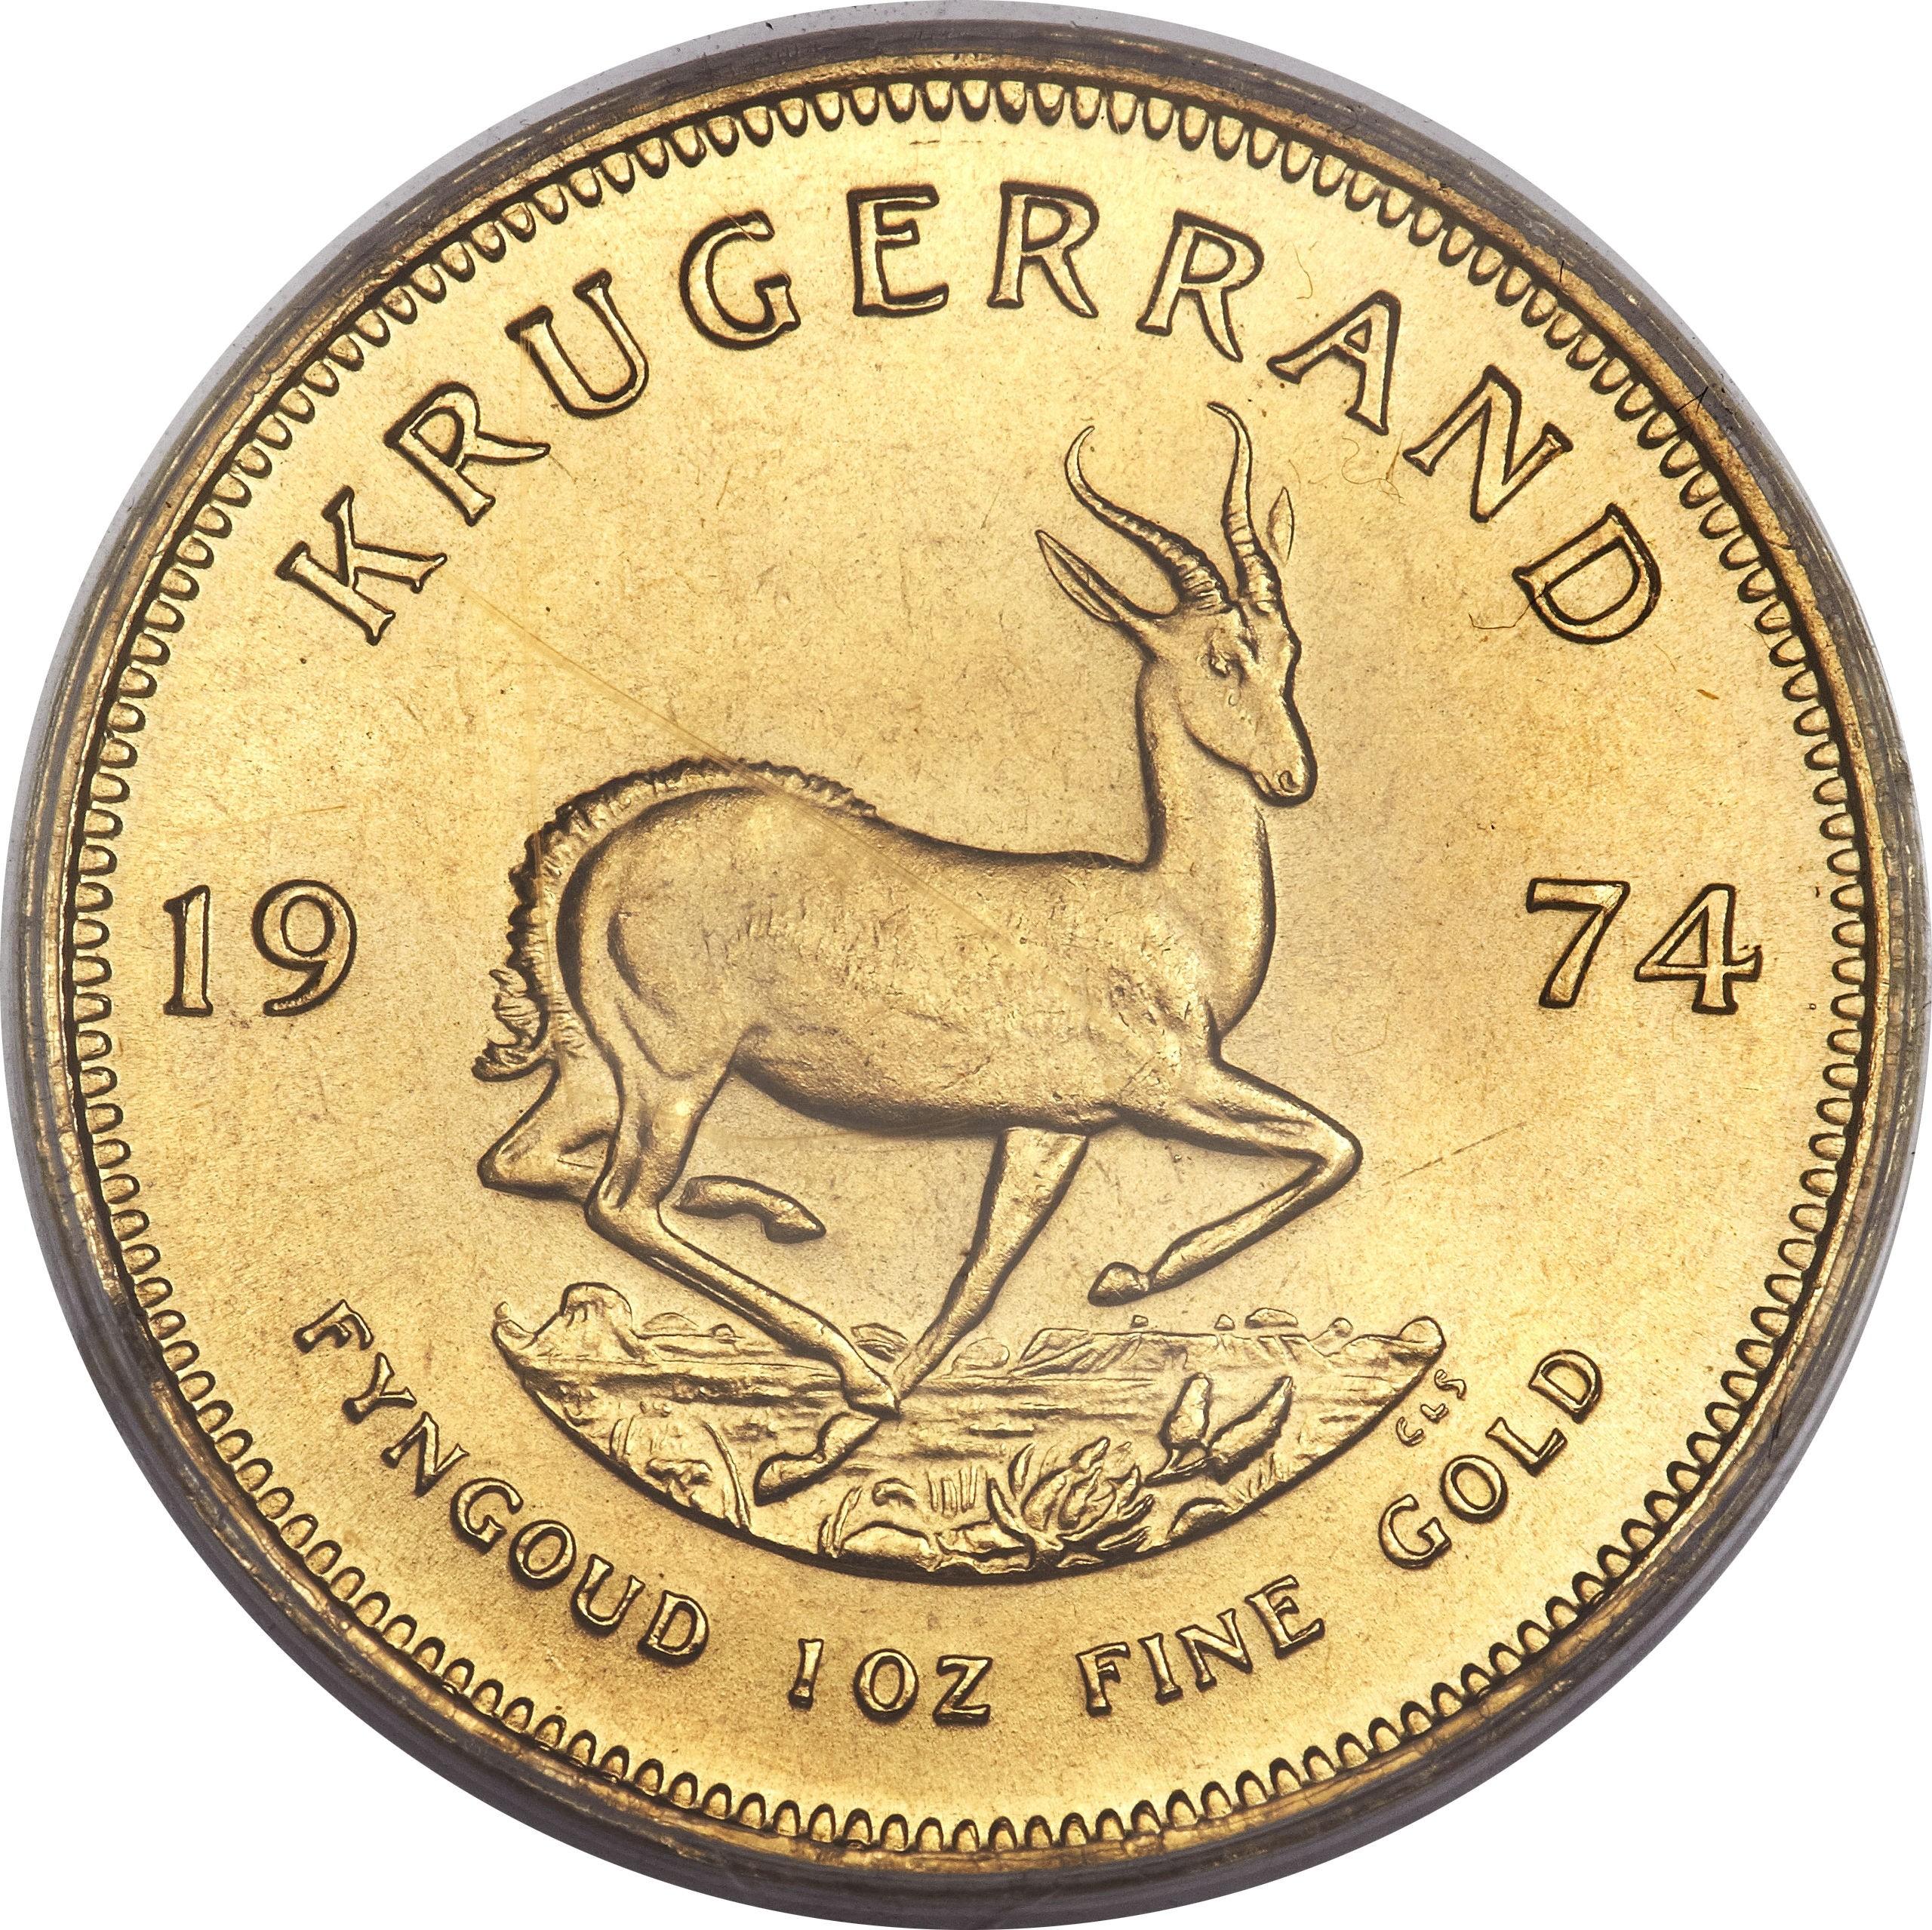 South Africa 1 Ounce Krugerrand (1967-2018)